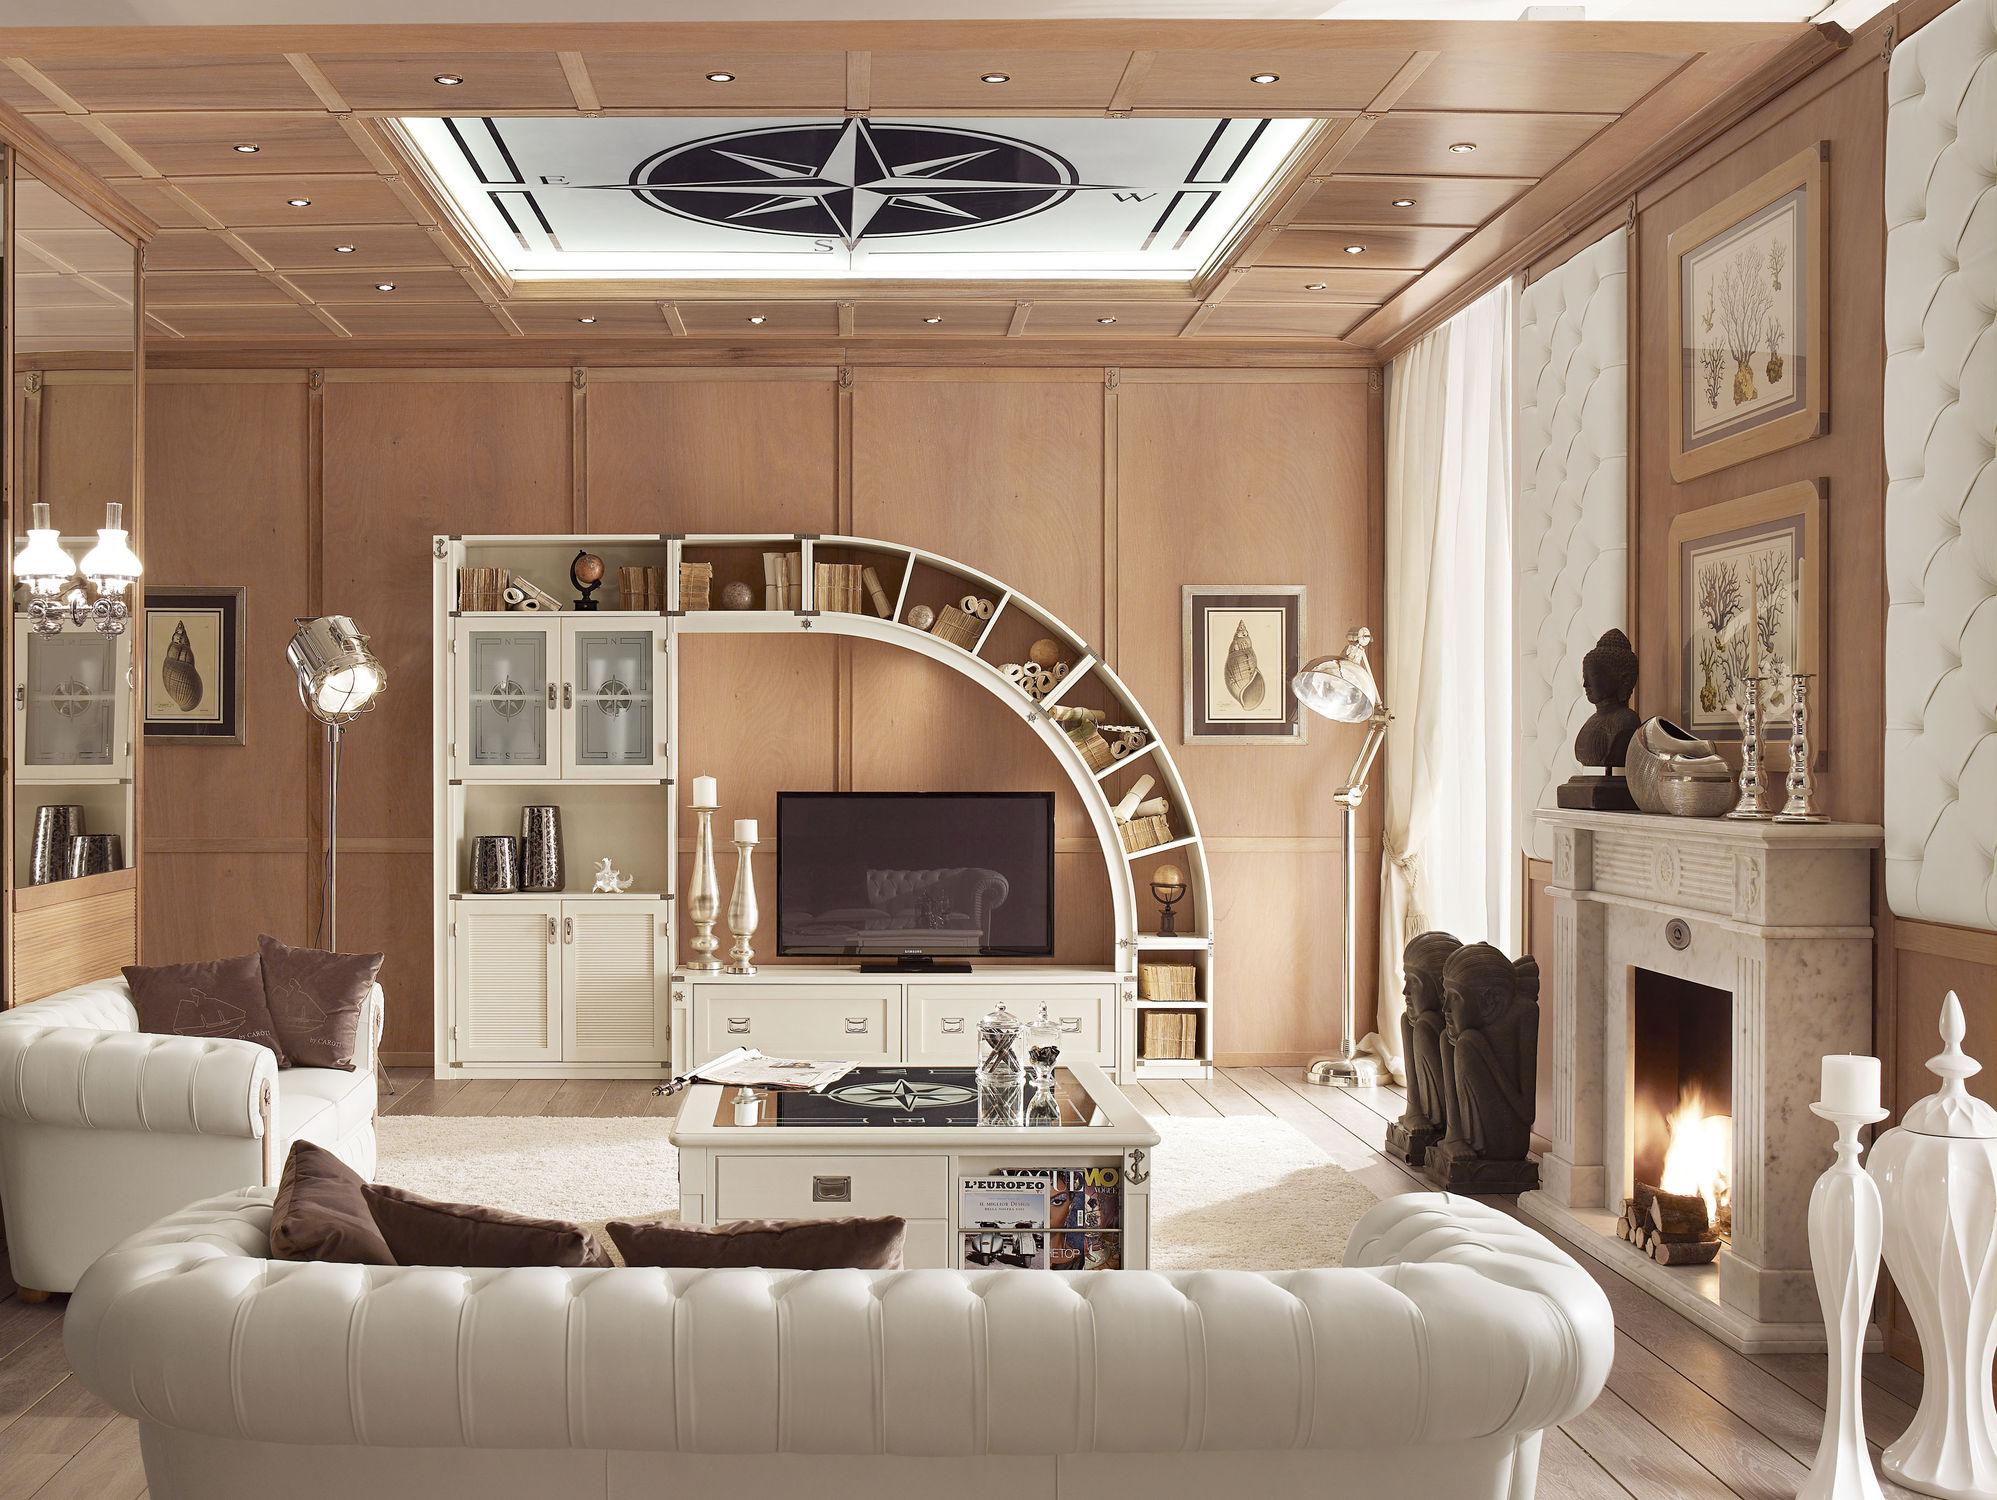 klassische wohnwand holz glas 848 caroti - Wohnwand Holz